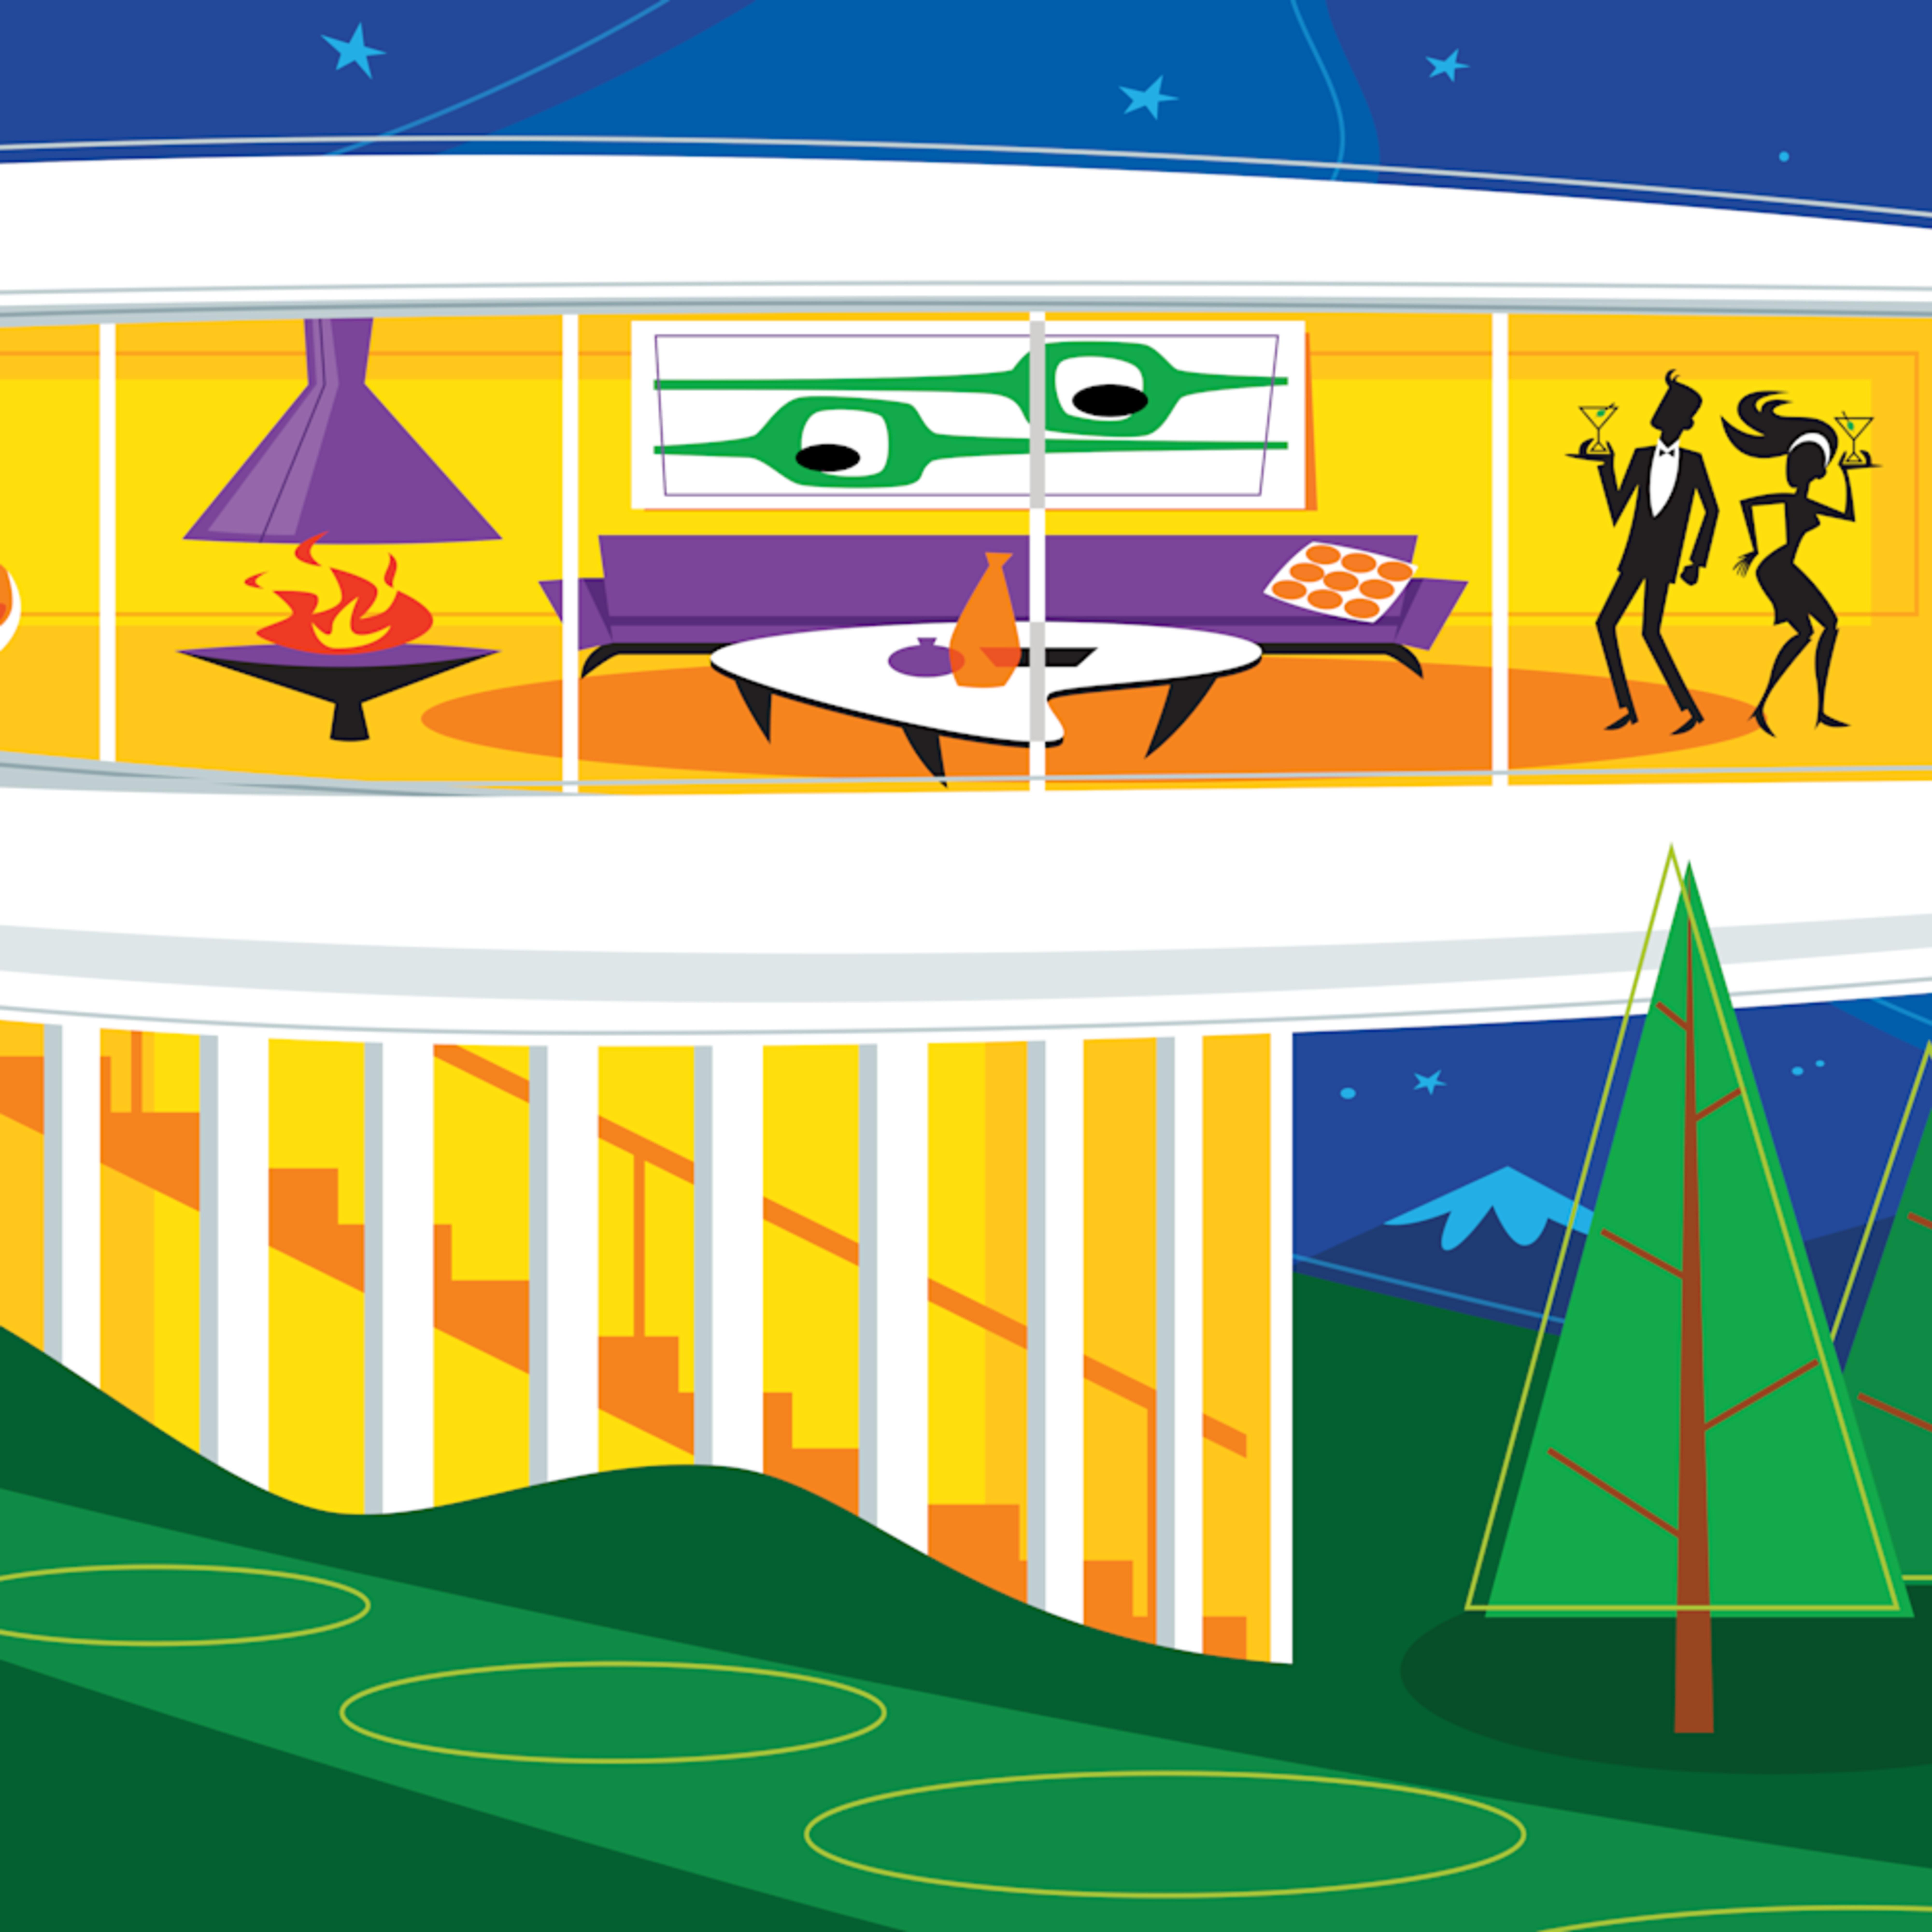 Colorado spaceship house ruuzmx